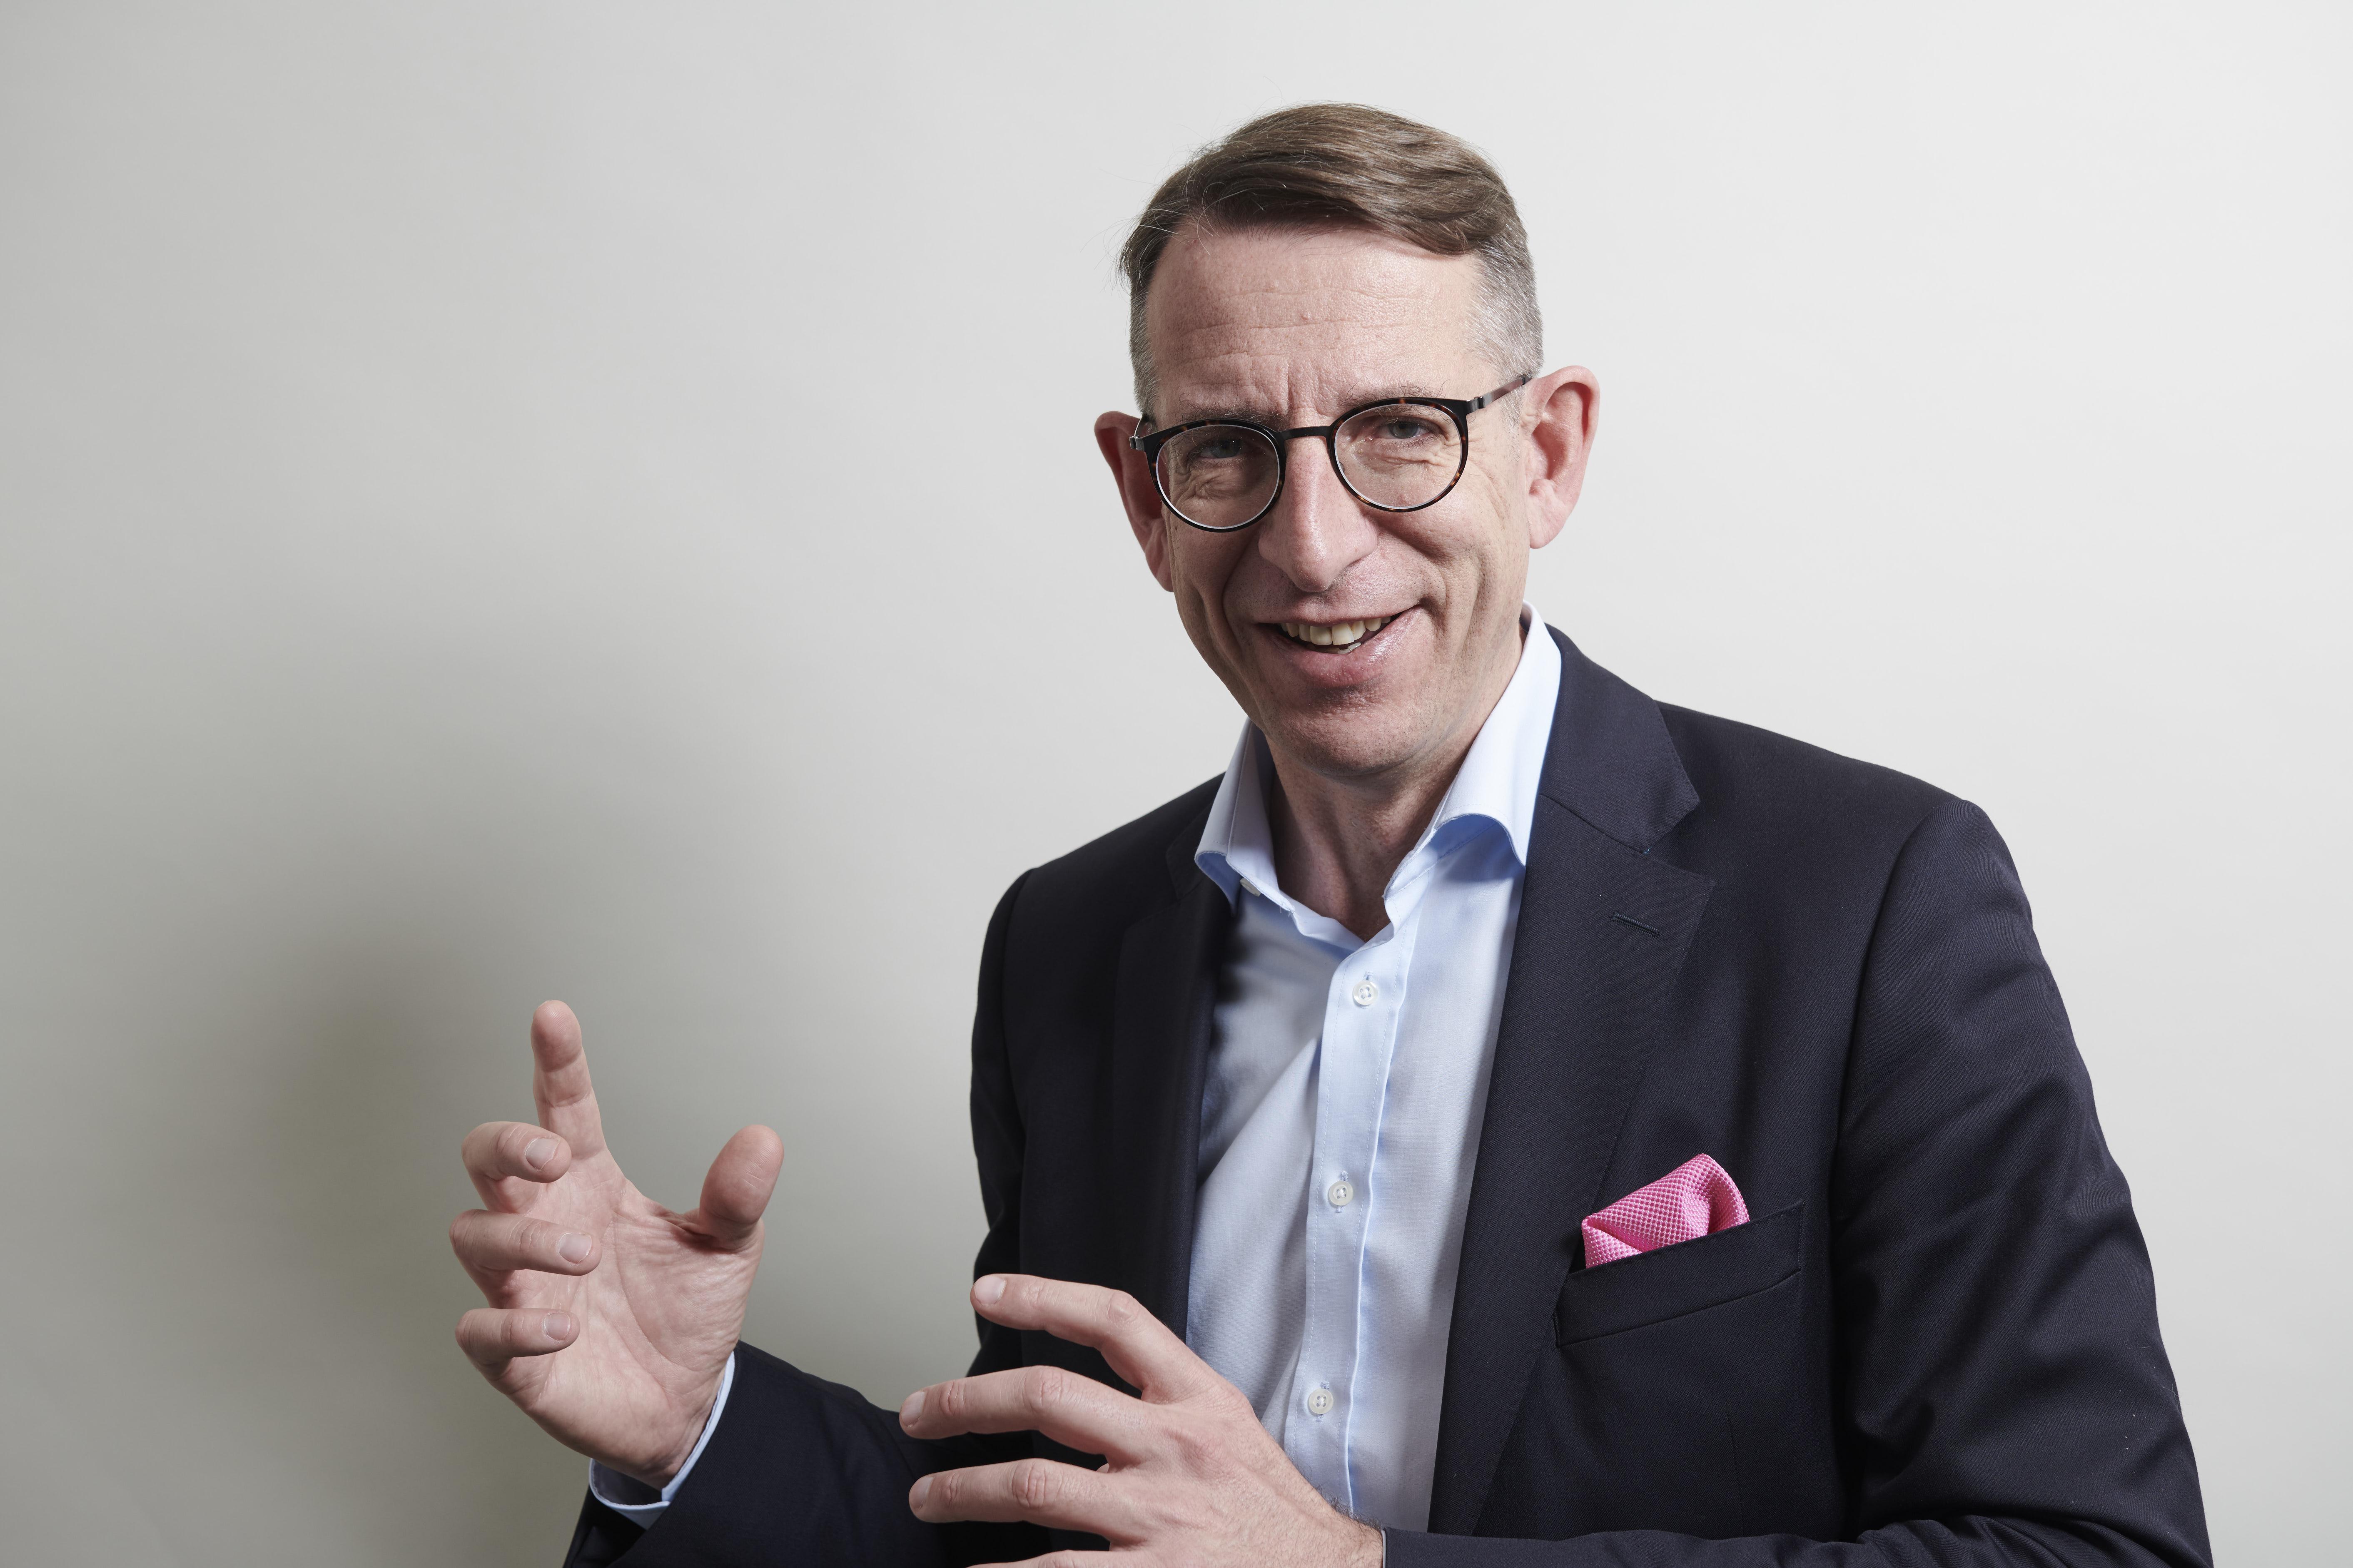 """The Business Caring Formula"" Podcast with Dr. Frank Jürgen Richter"